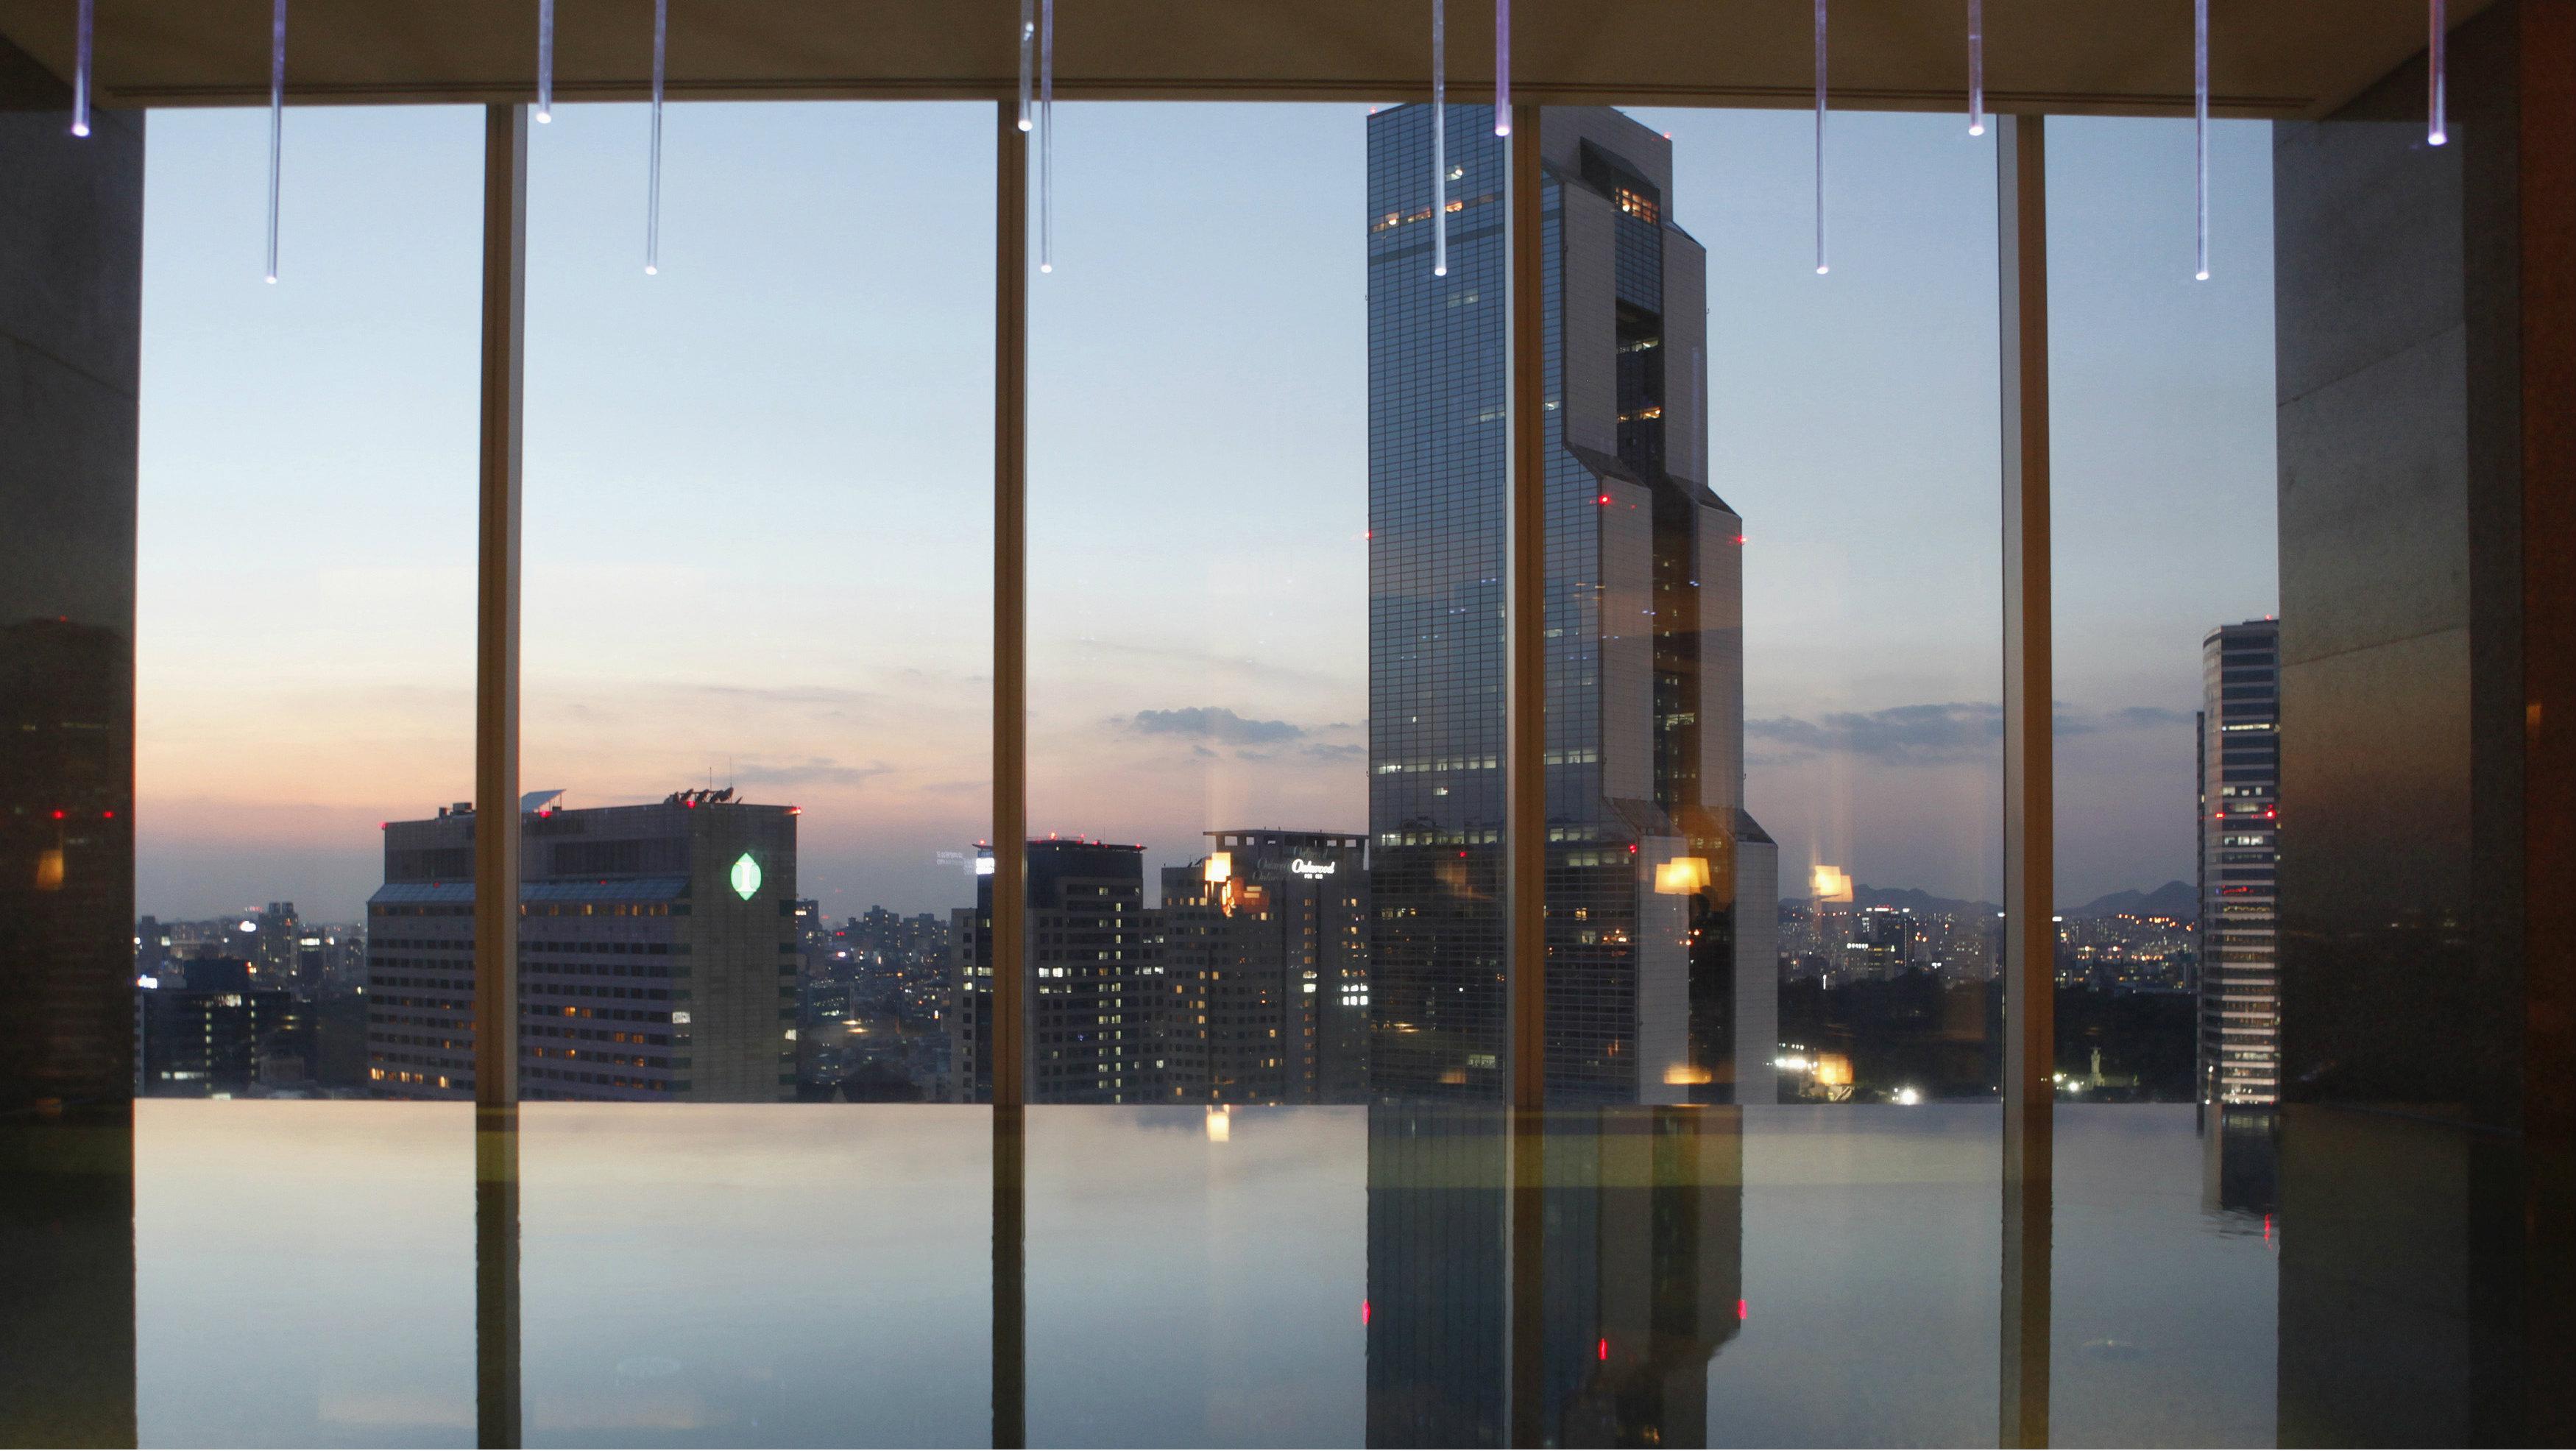 gangnam style psy seoul south korea luxury property prices2